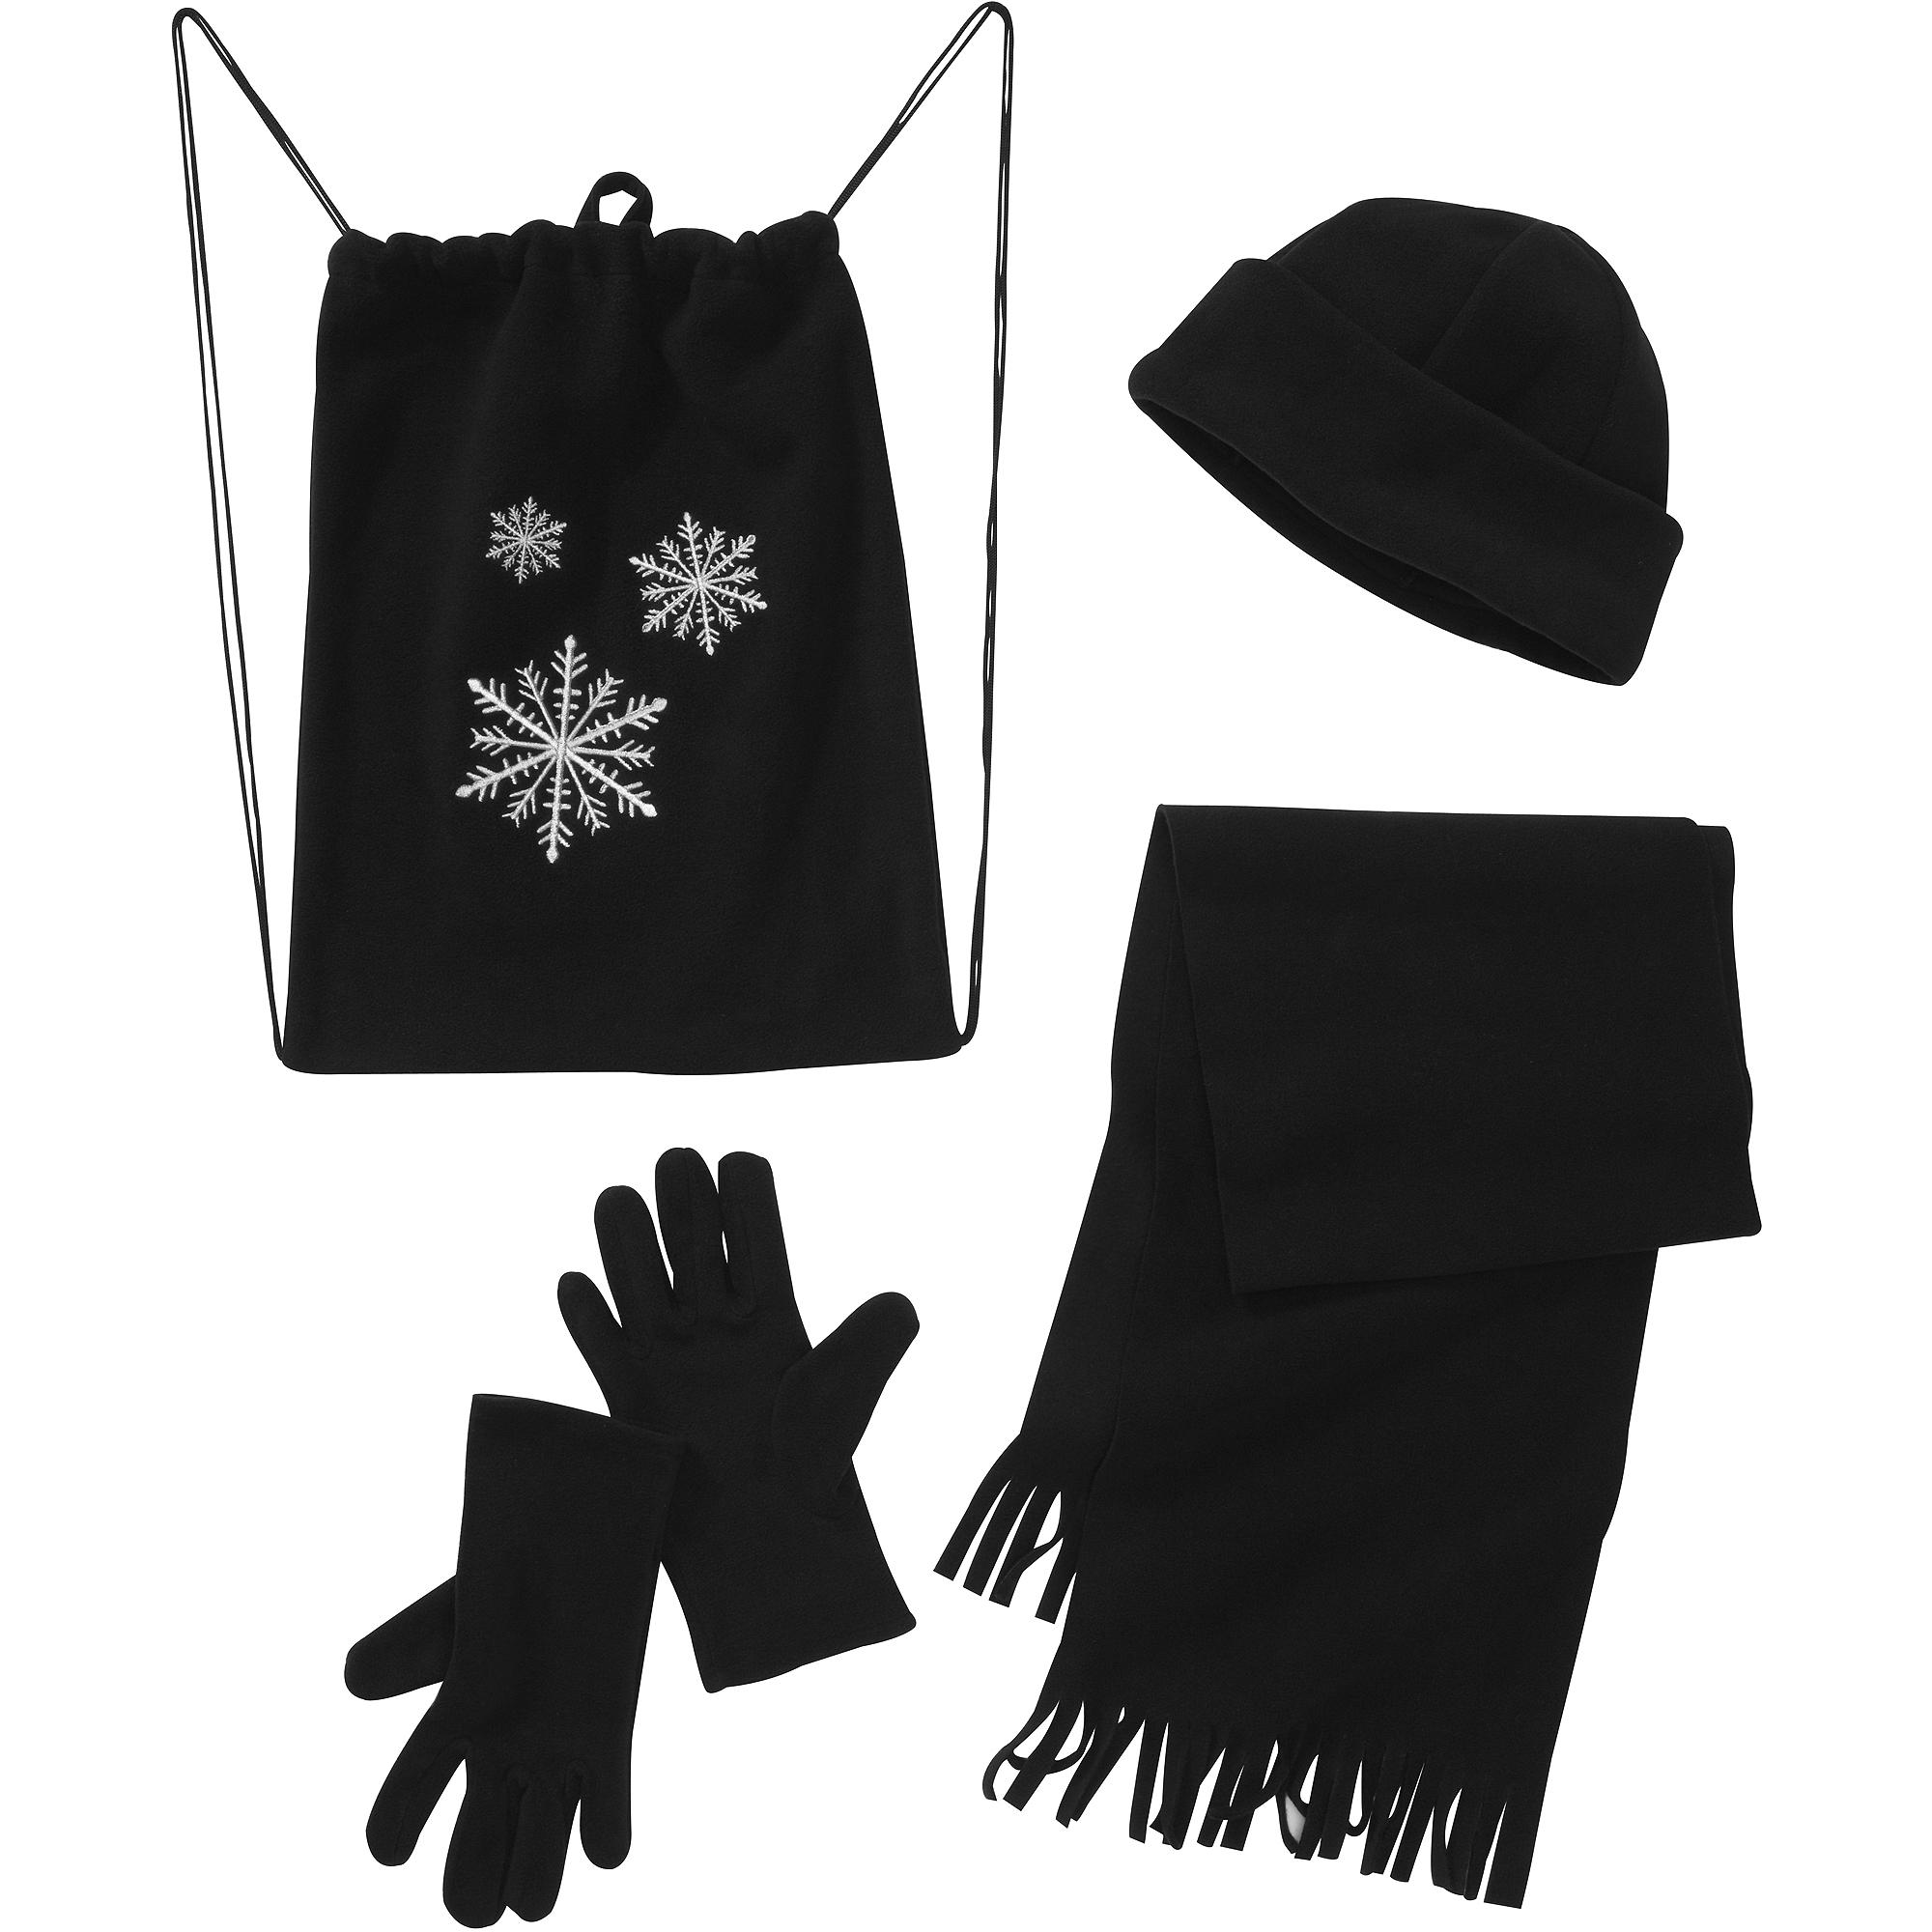 Women's 4-Piece Bag, Hat, Scarf and Gloves Fleece Gift Set